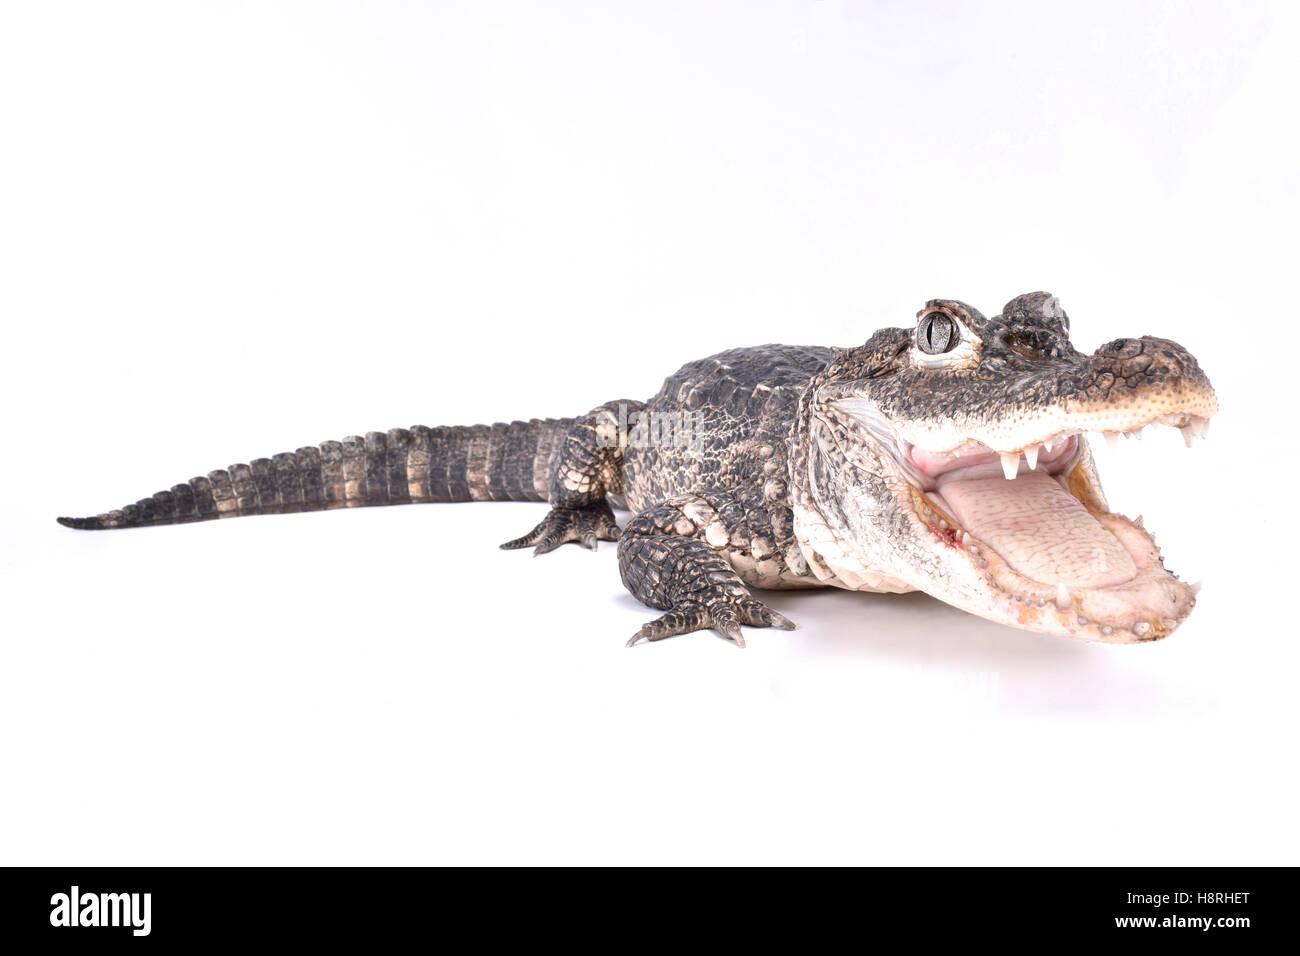 Chinese alligator, Alligator sinensis - Stock Image